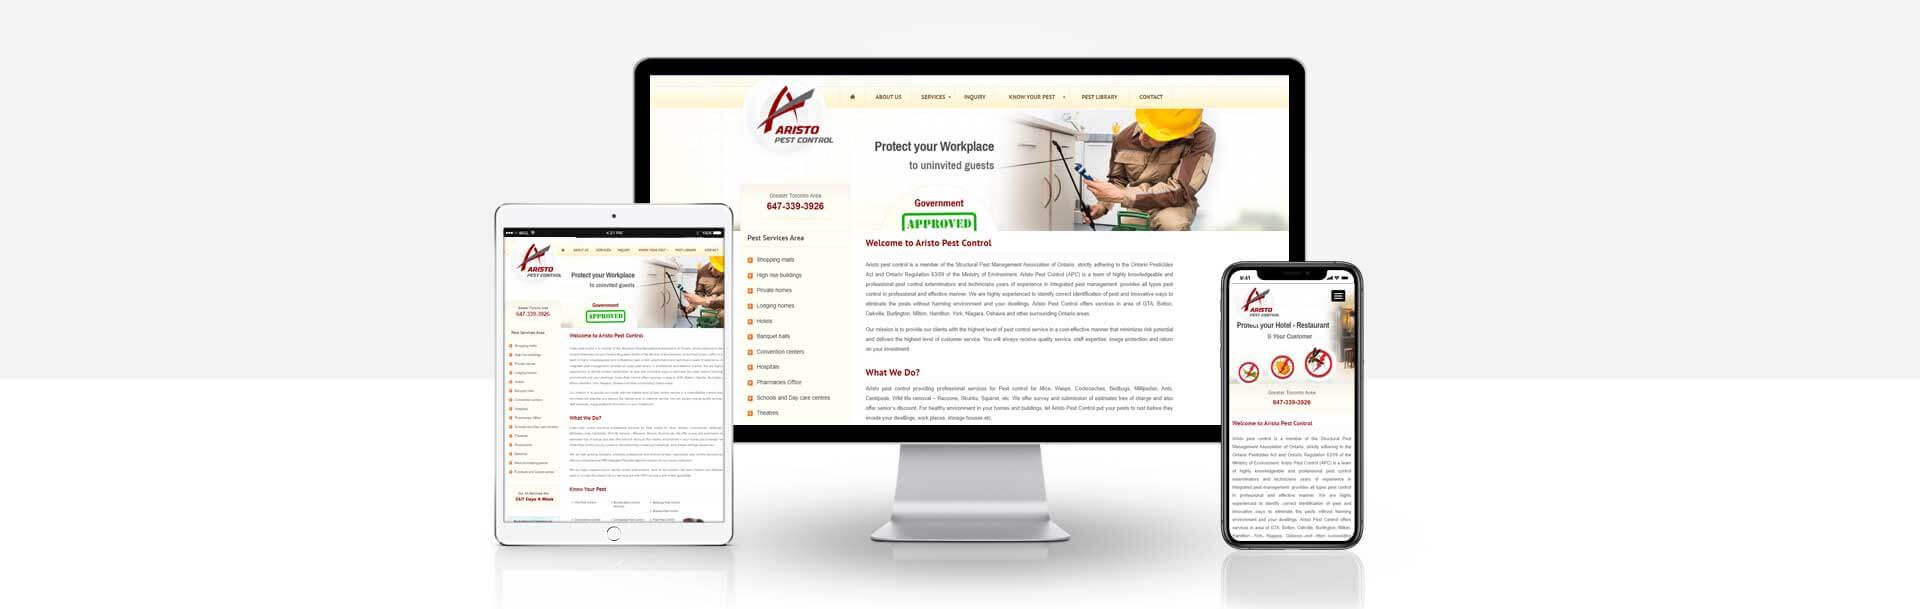 Wordpress Pest Control Services website